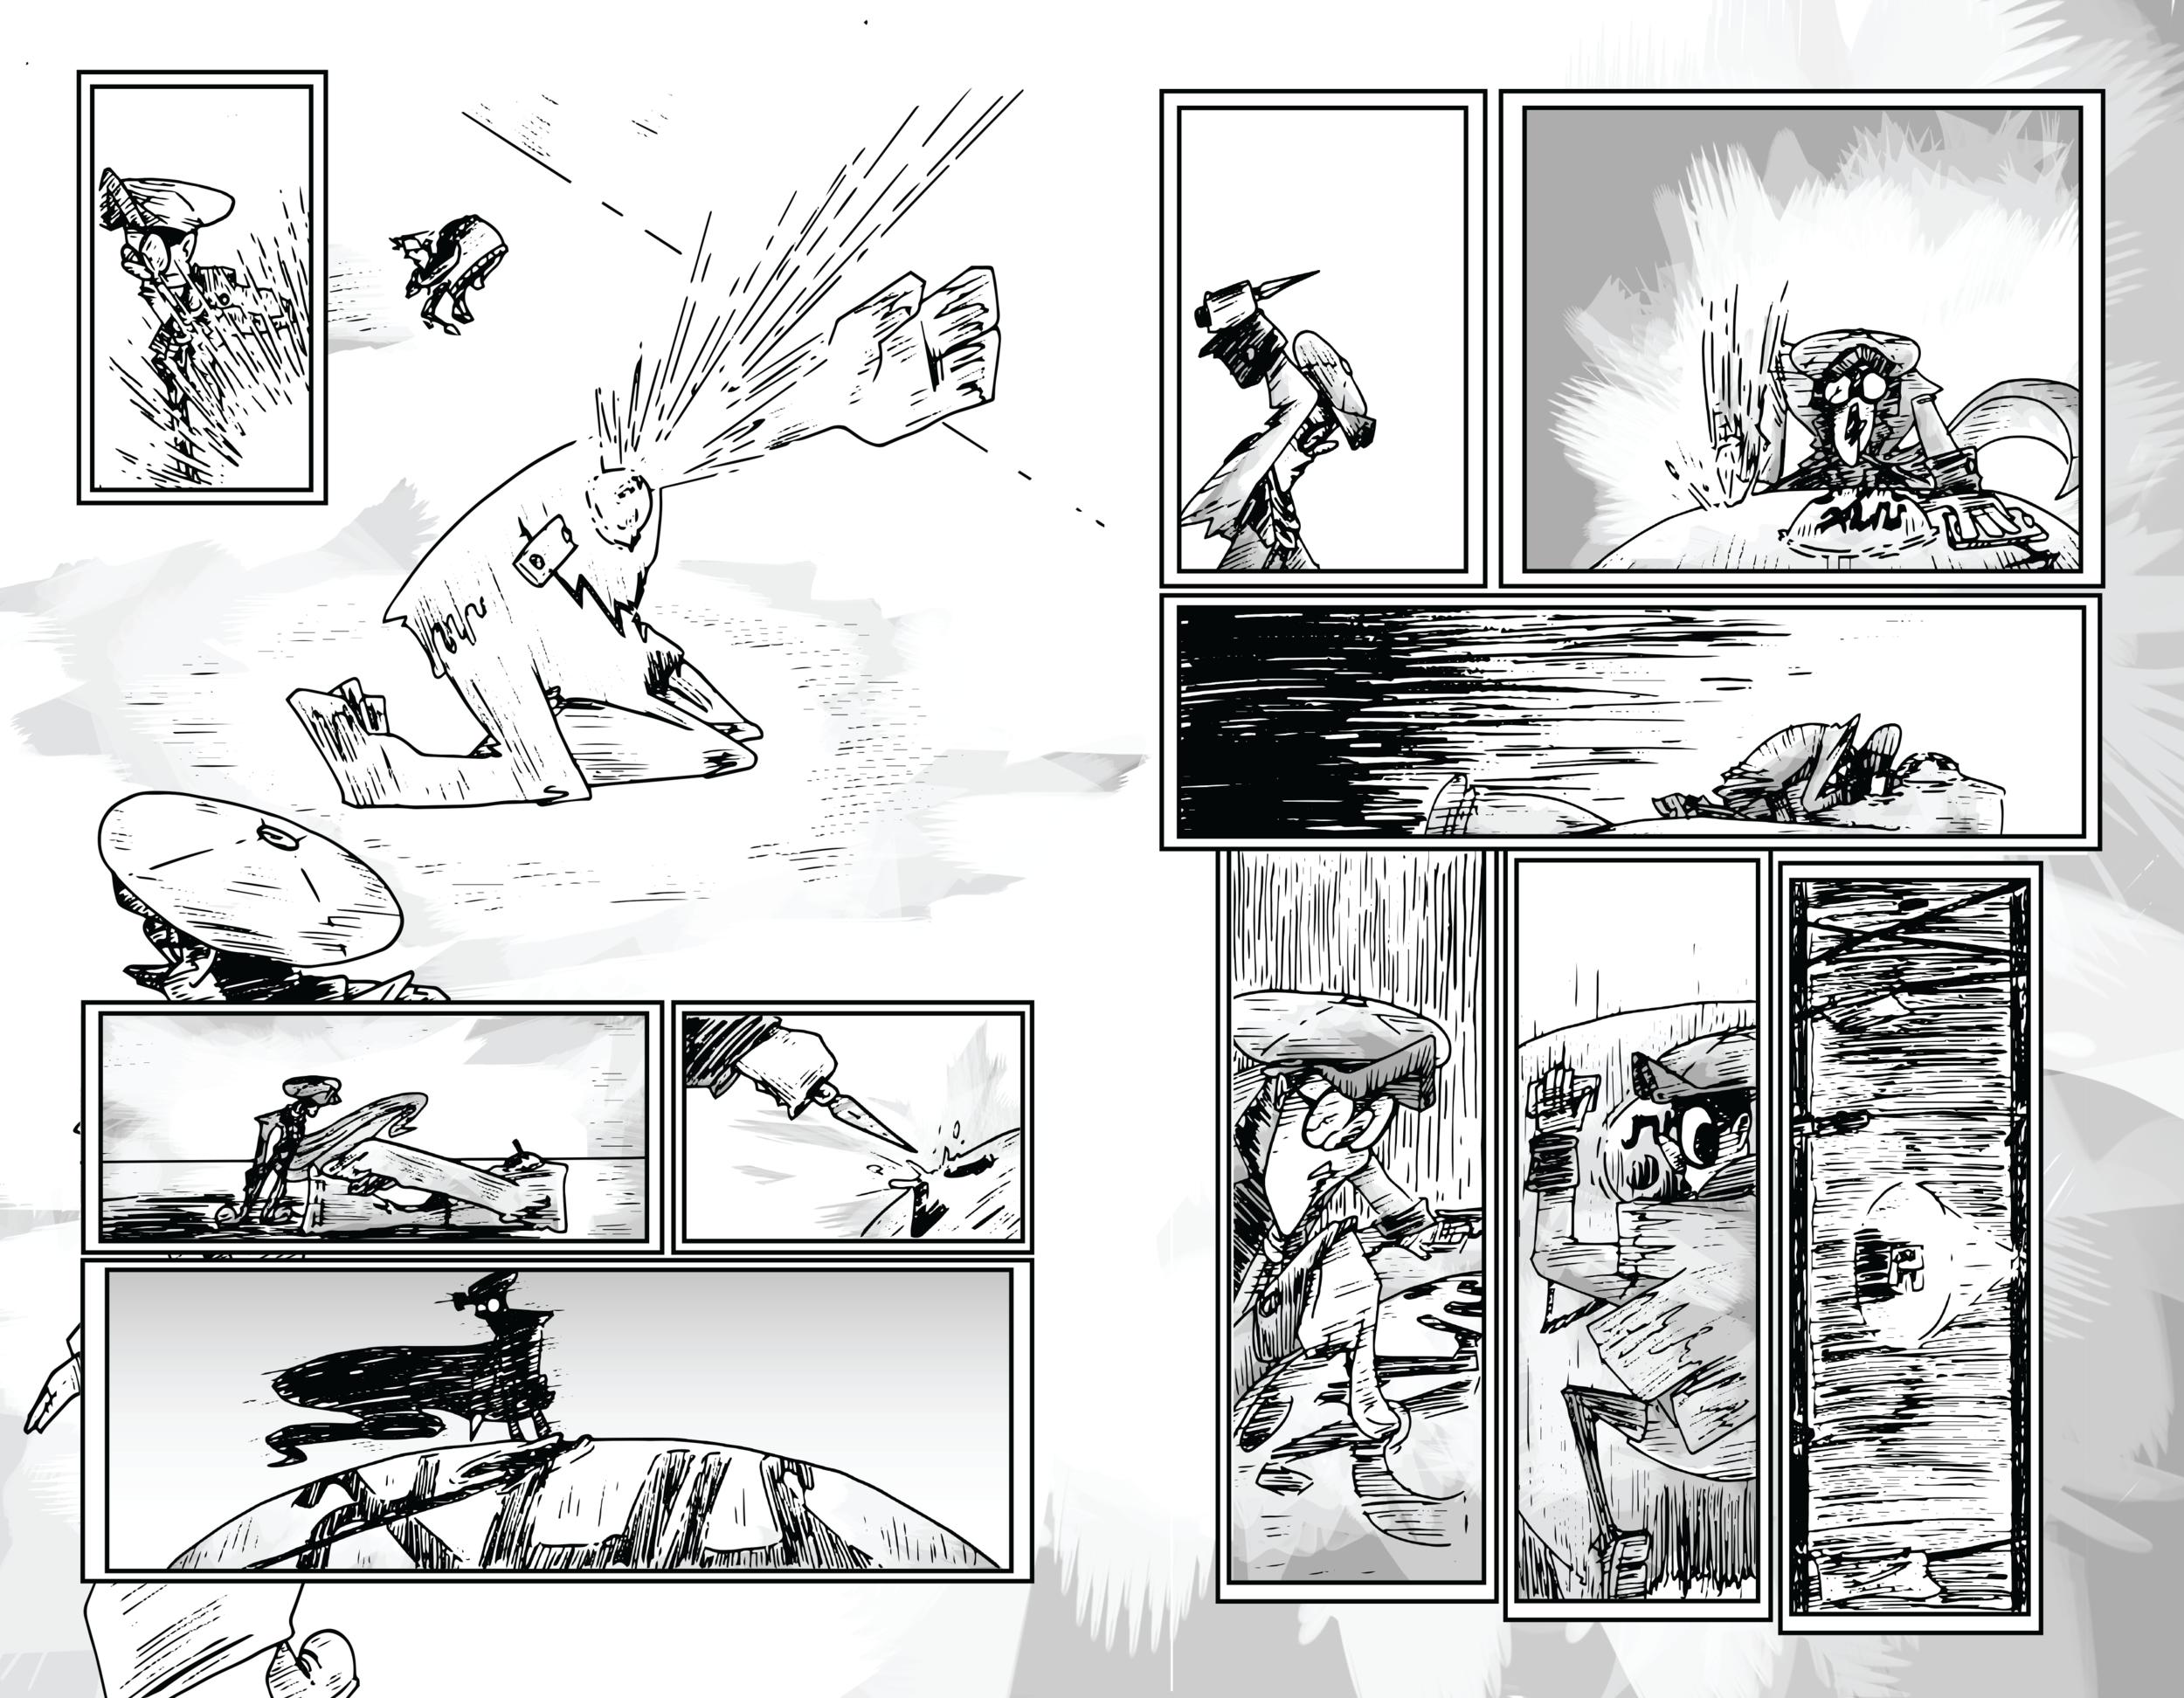 GOLEM #1 PAGE SPREAD 1-2